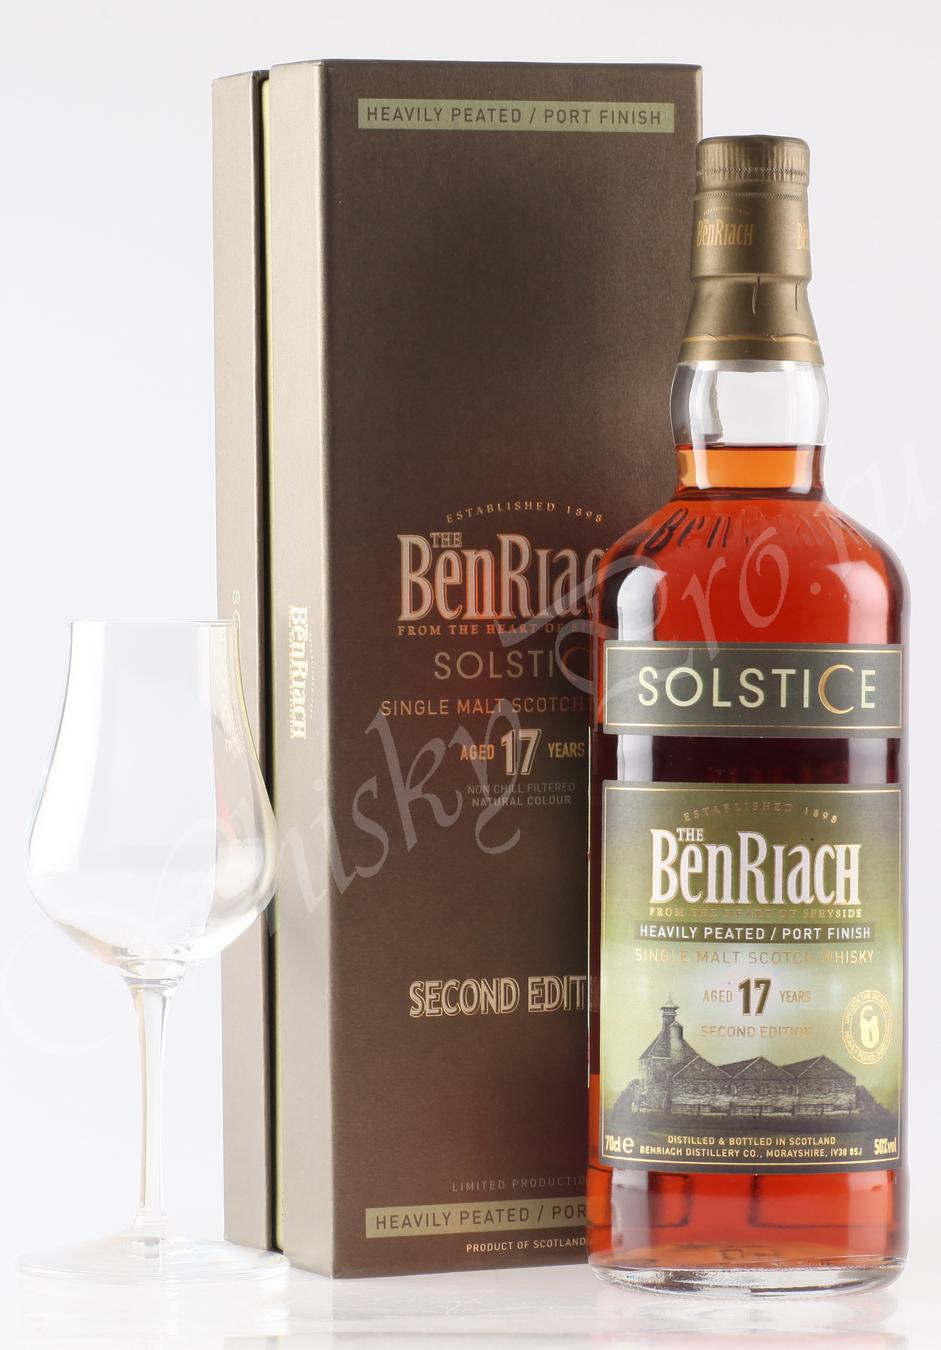 Виски Бенриах 17 лет Солстик шотландский виски Benriach Solstice